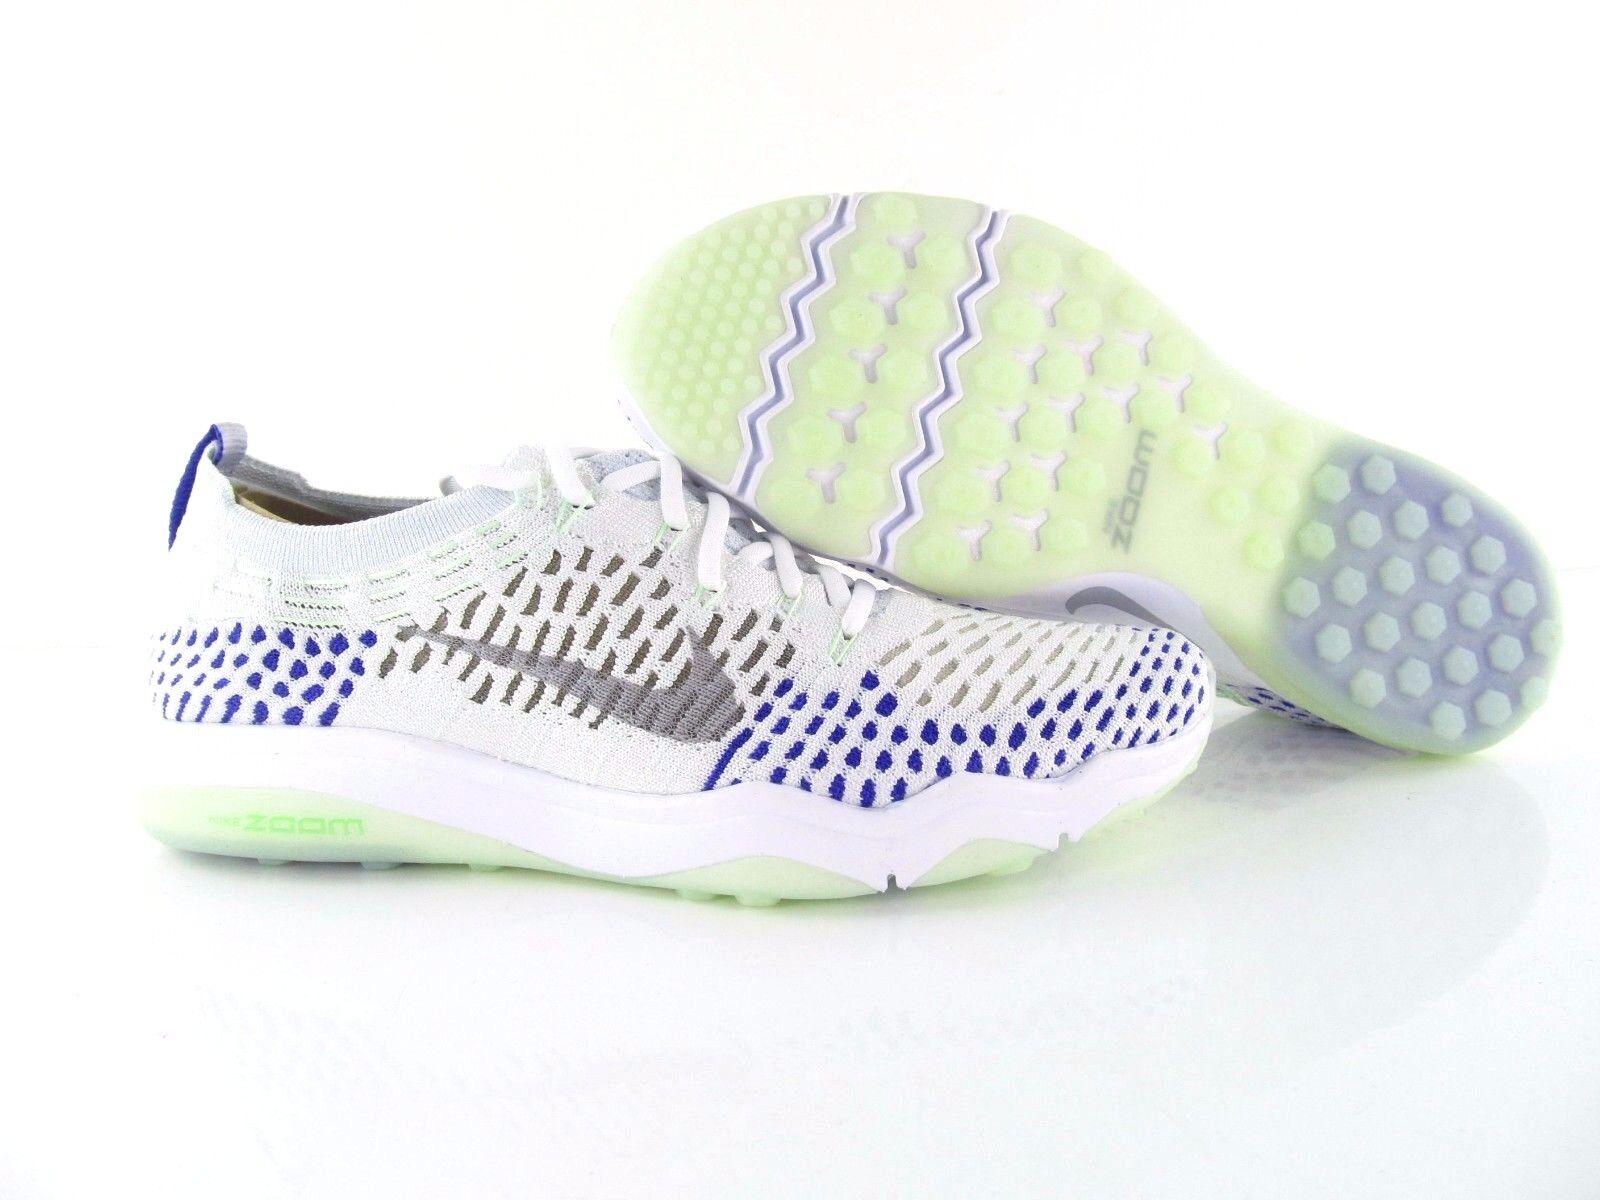 Nike Air Zoom Fearless Flyknit Cross Fit Training Hyper Grape blanc US_11 Eur 43